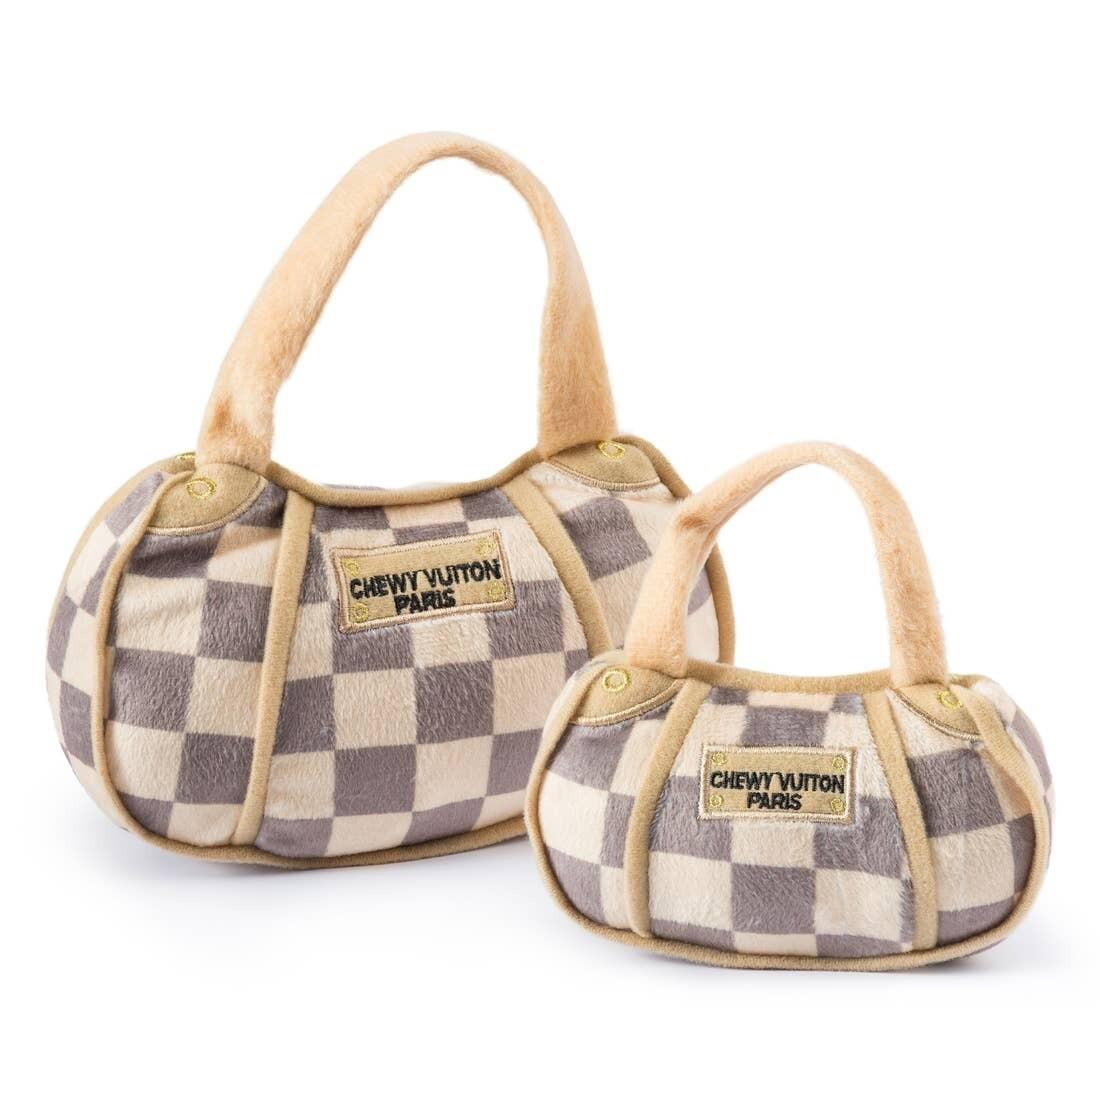 Chewy Vuitton Checker Handbag Toy